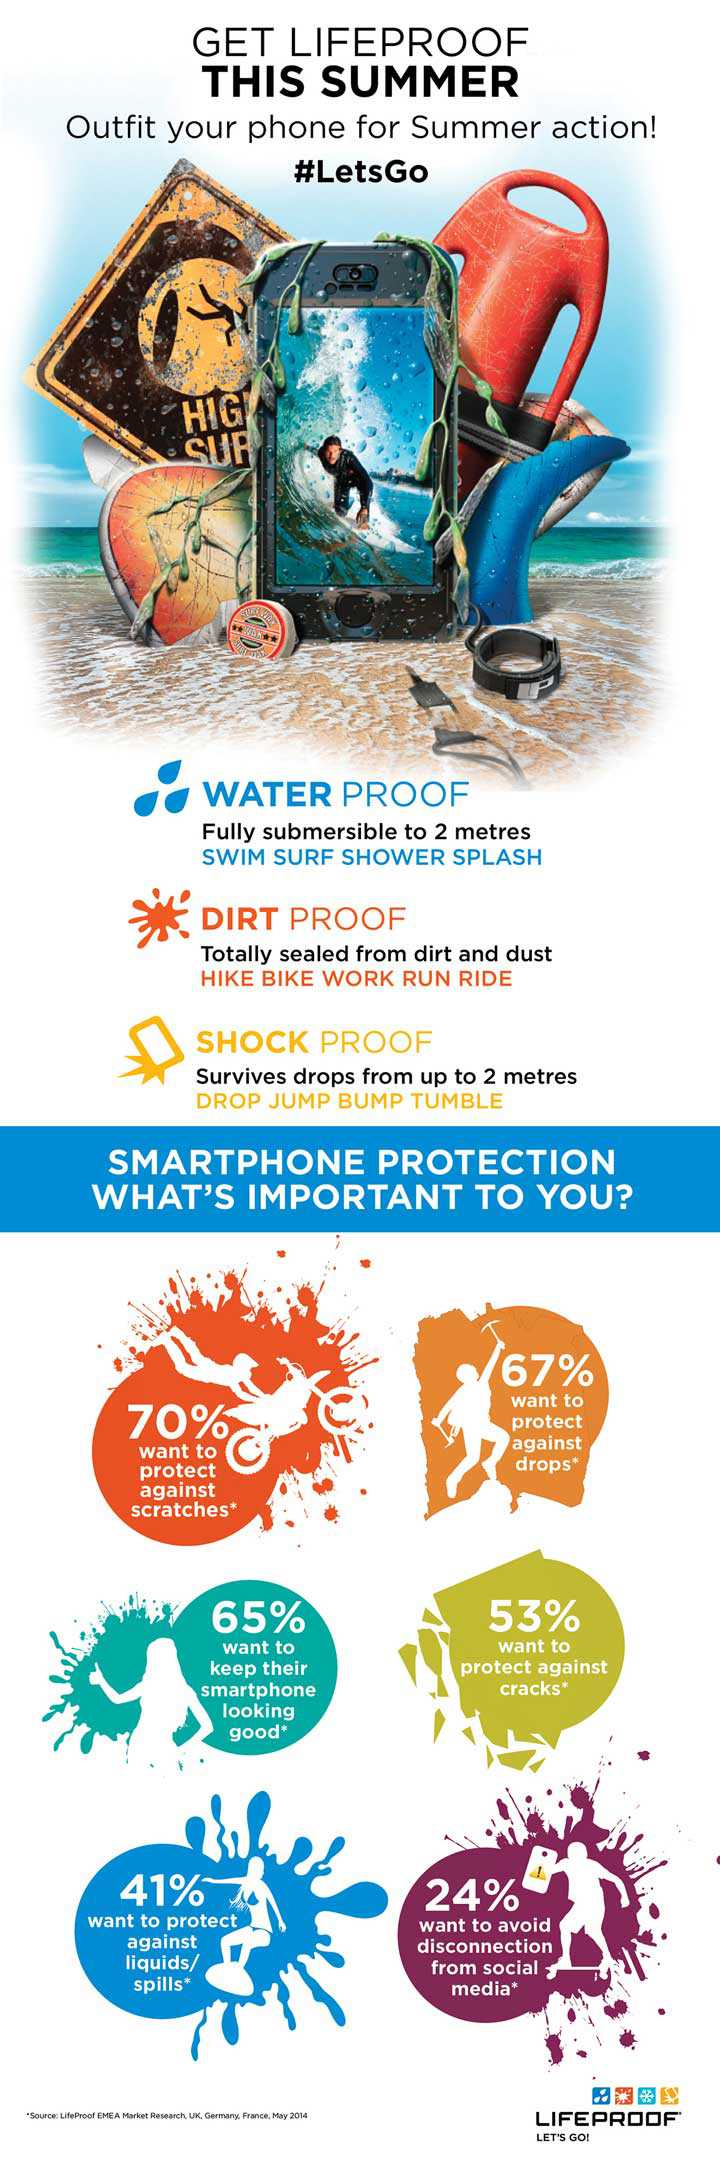 LifeProof_Summer_Infographic_2014